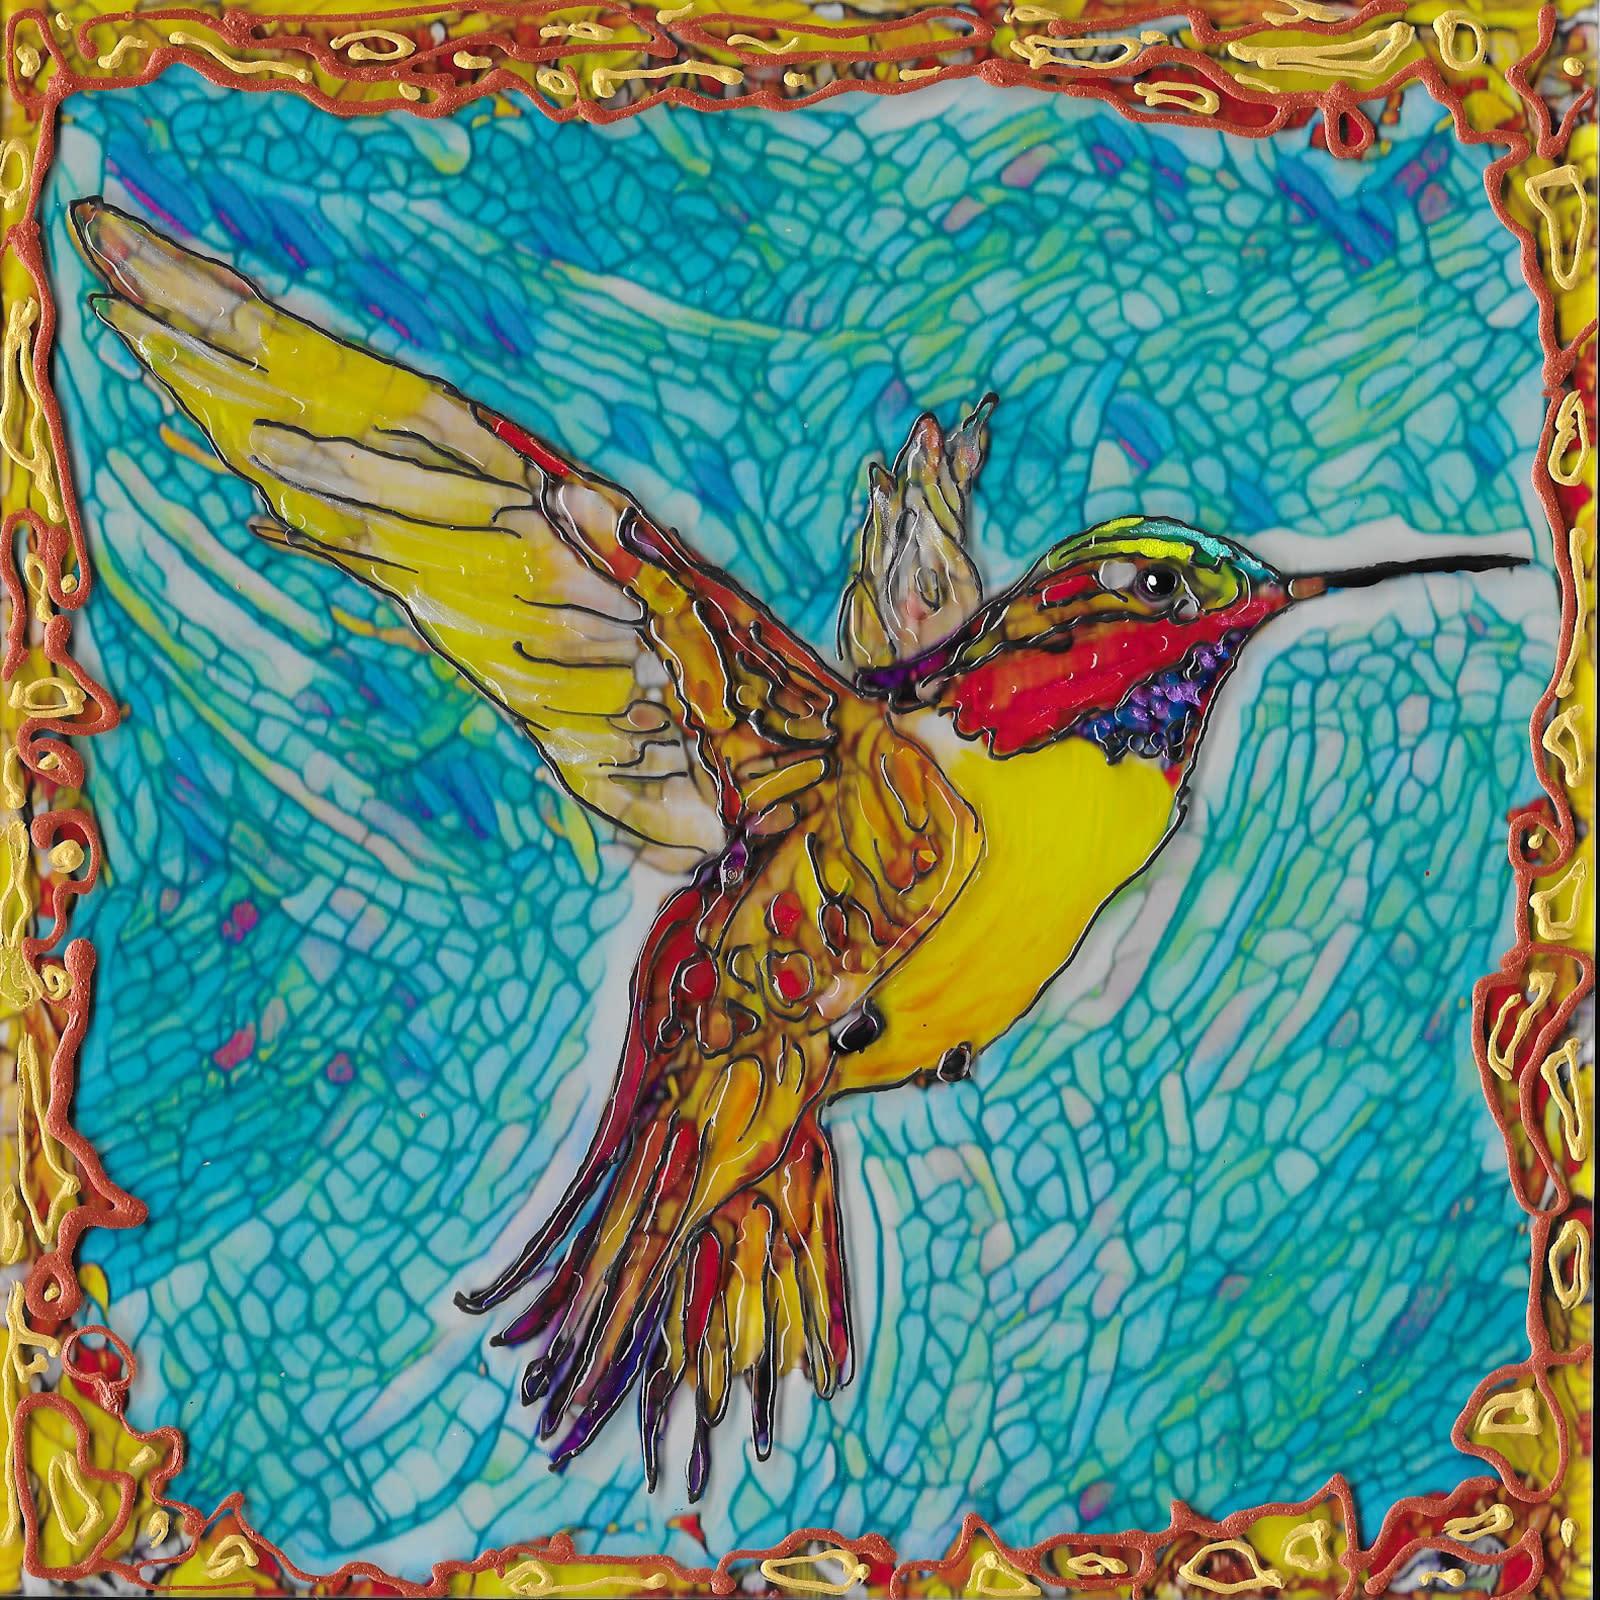 Flying hummer 1 on acrylic cdhv6o